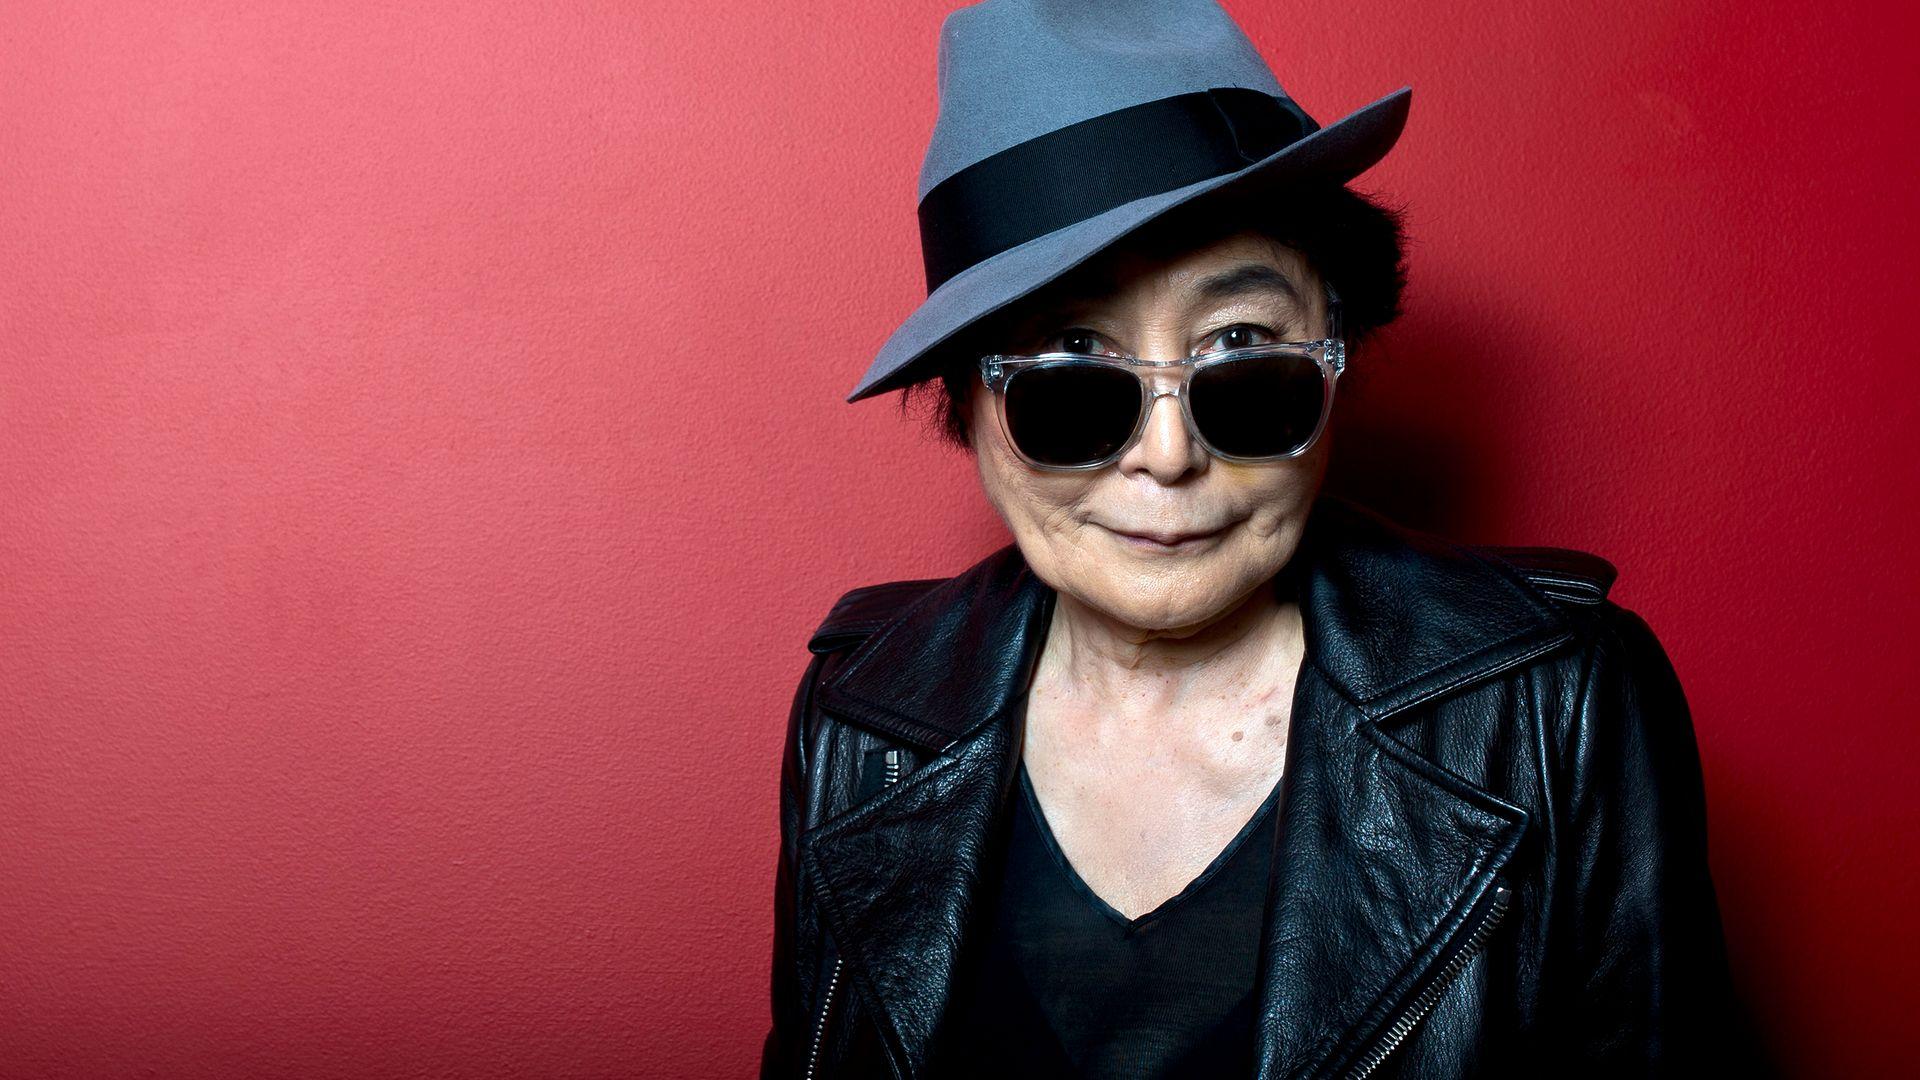 TRANSGRESSOR: Yoko Ono, in 2013 - Credit: Getty Images